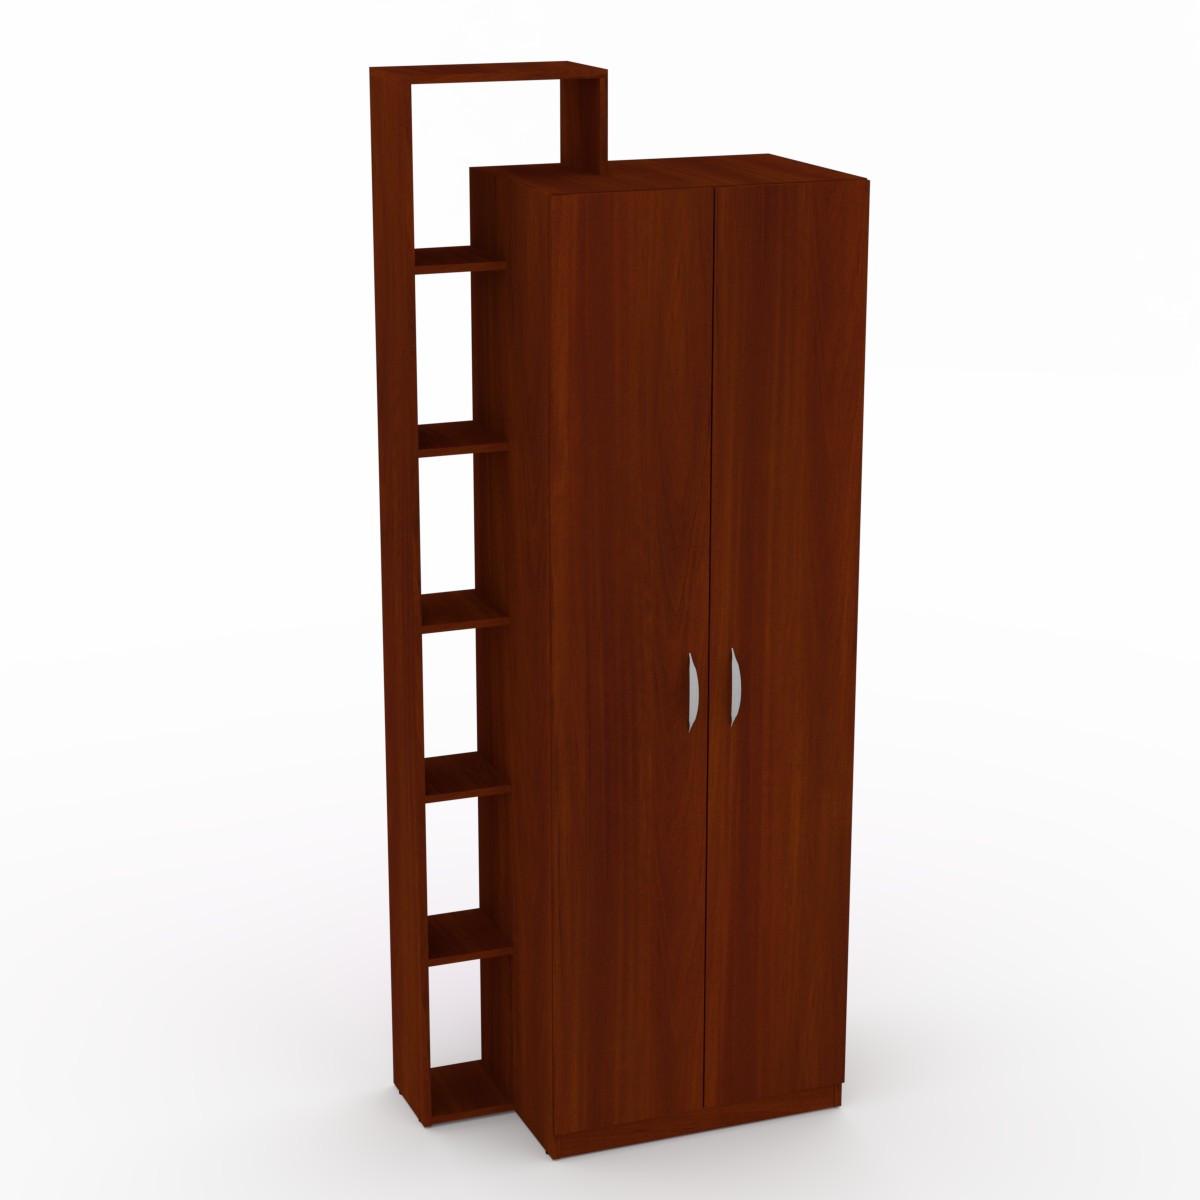 Шкаф платяной 9 яблоня Компанит (85х47х215 см)